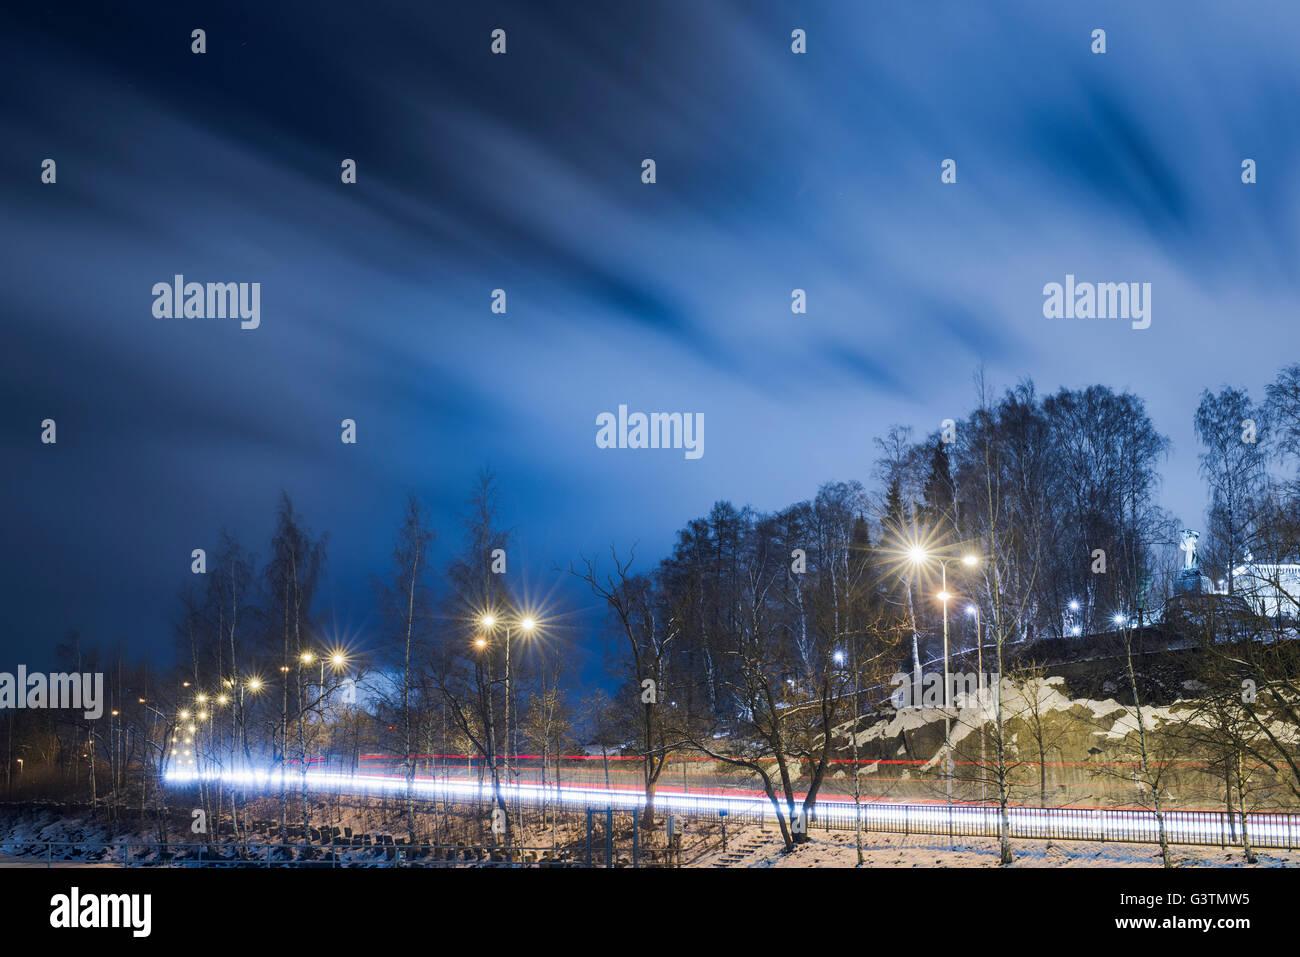 Finland, Pirkanmaa, Tampere, Kekkosentie, Light trail on road at night - Stock Image